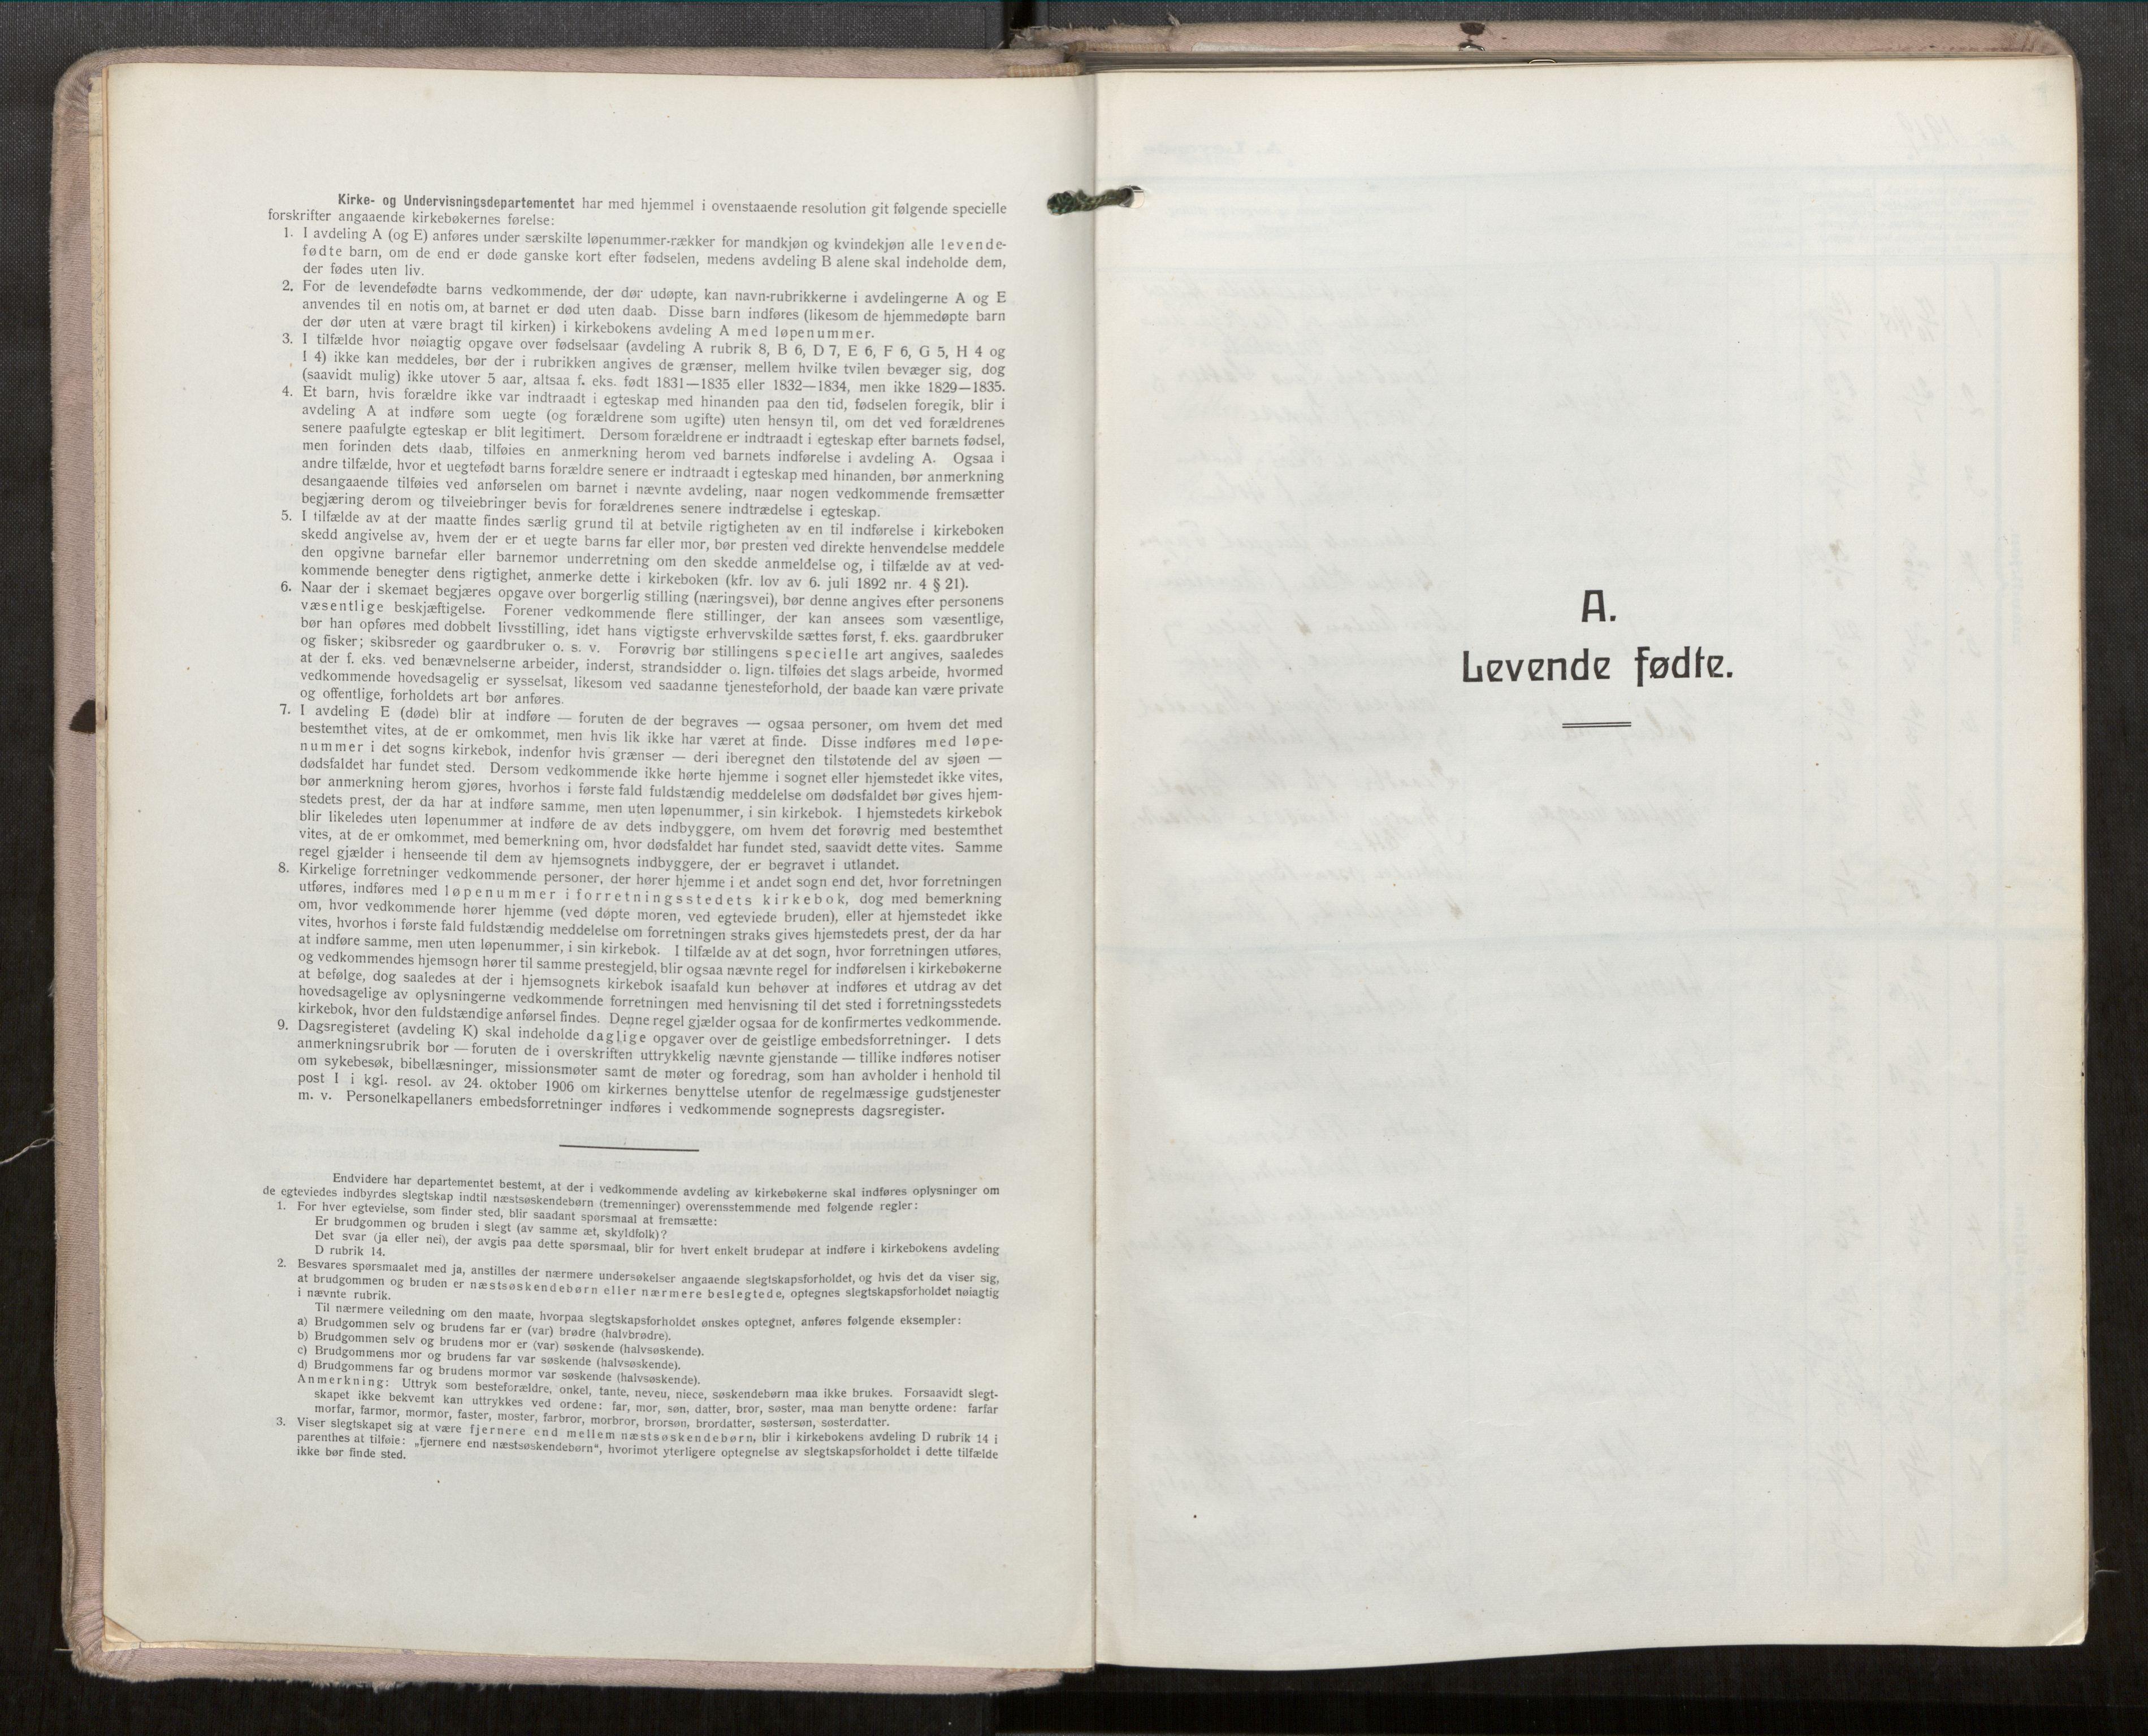 SAT, Grytten sokneprestkontor, Ministerialbok nr. 546A04, 1919-1956